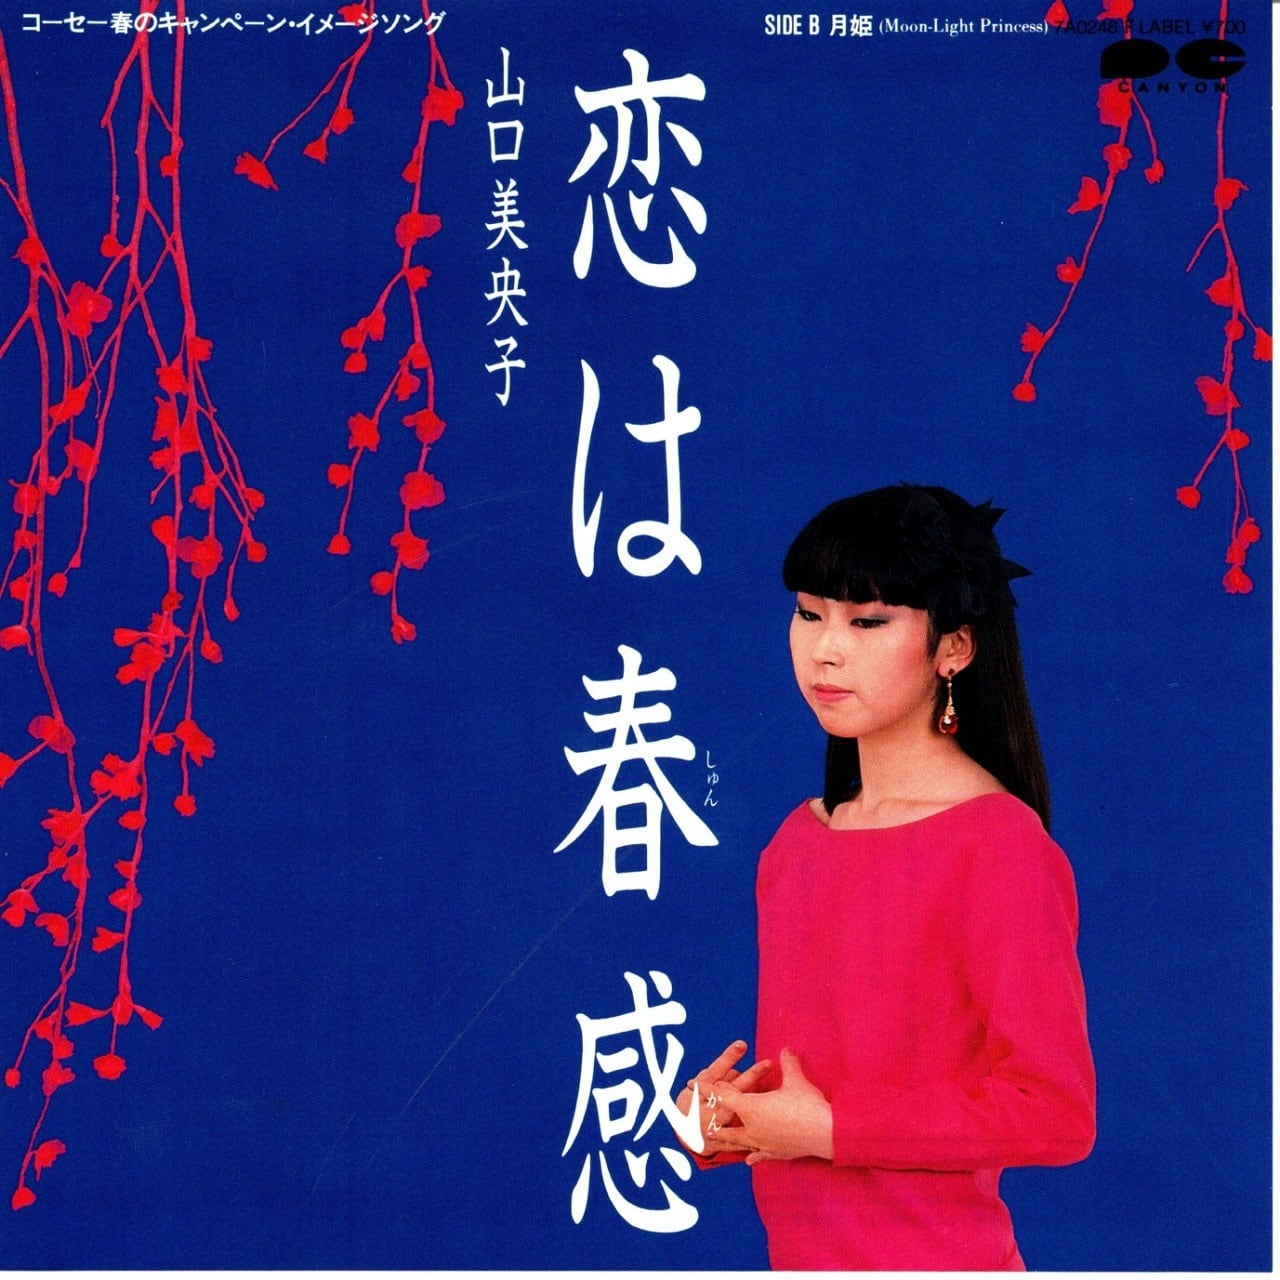 【7inch・国内盤】山口美央子 / 恋は春感